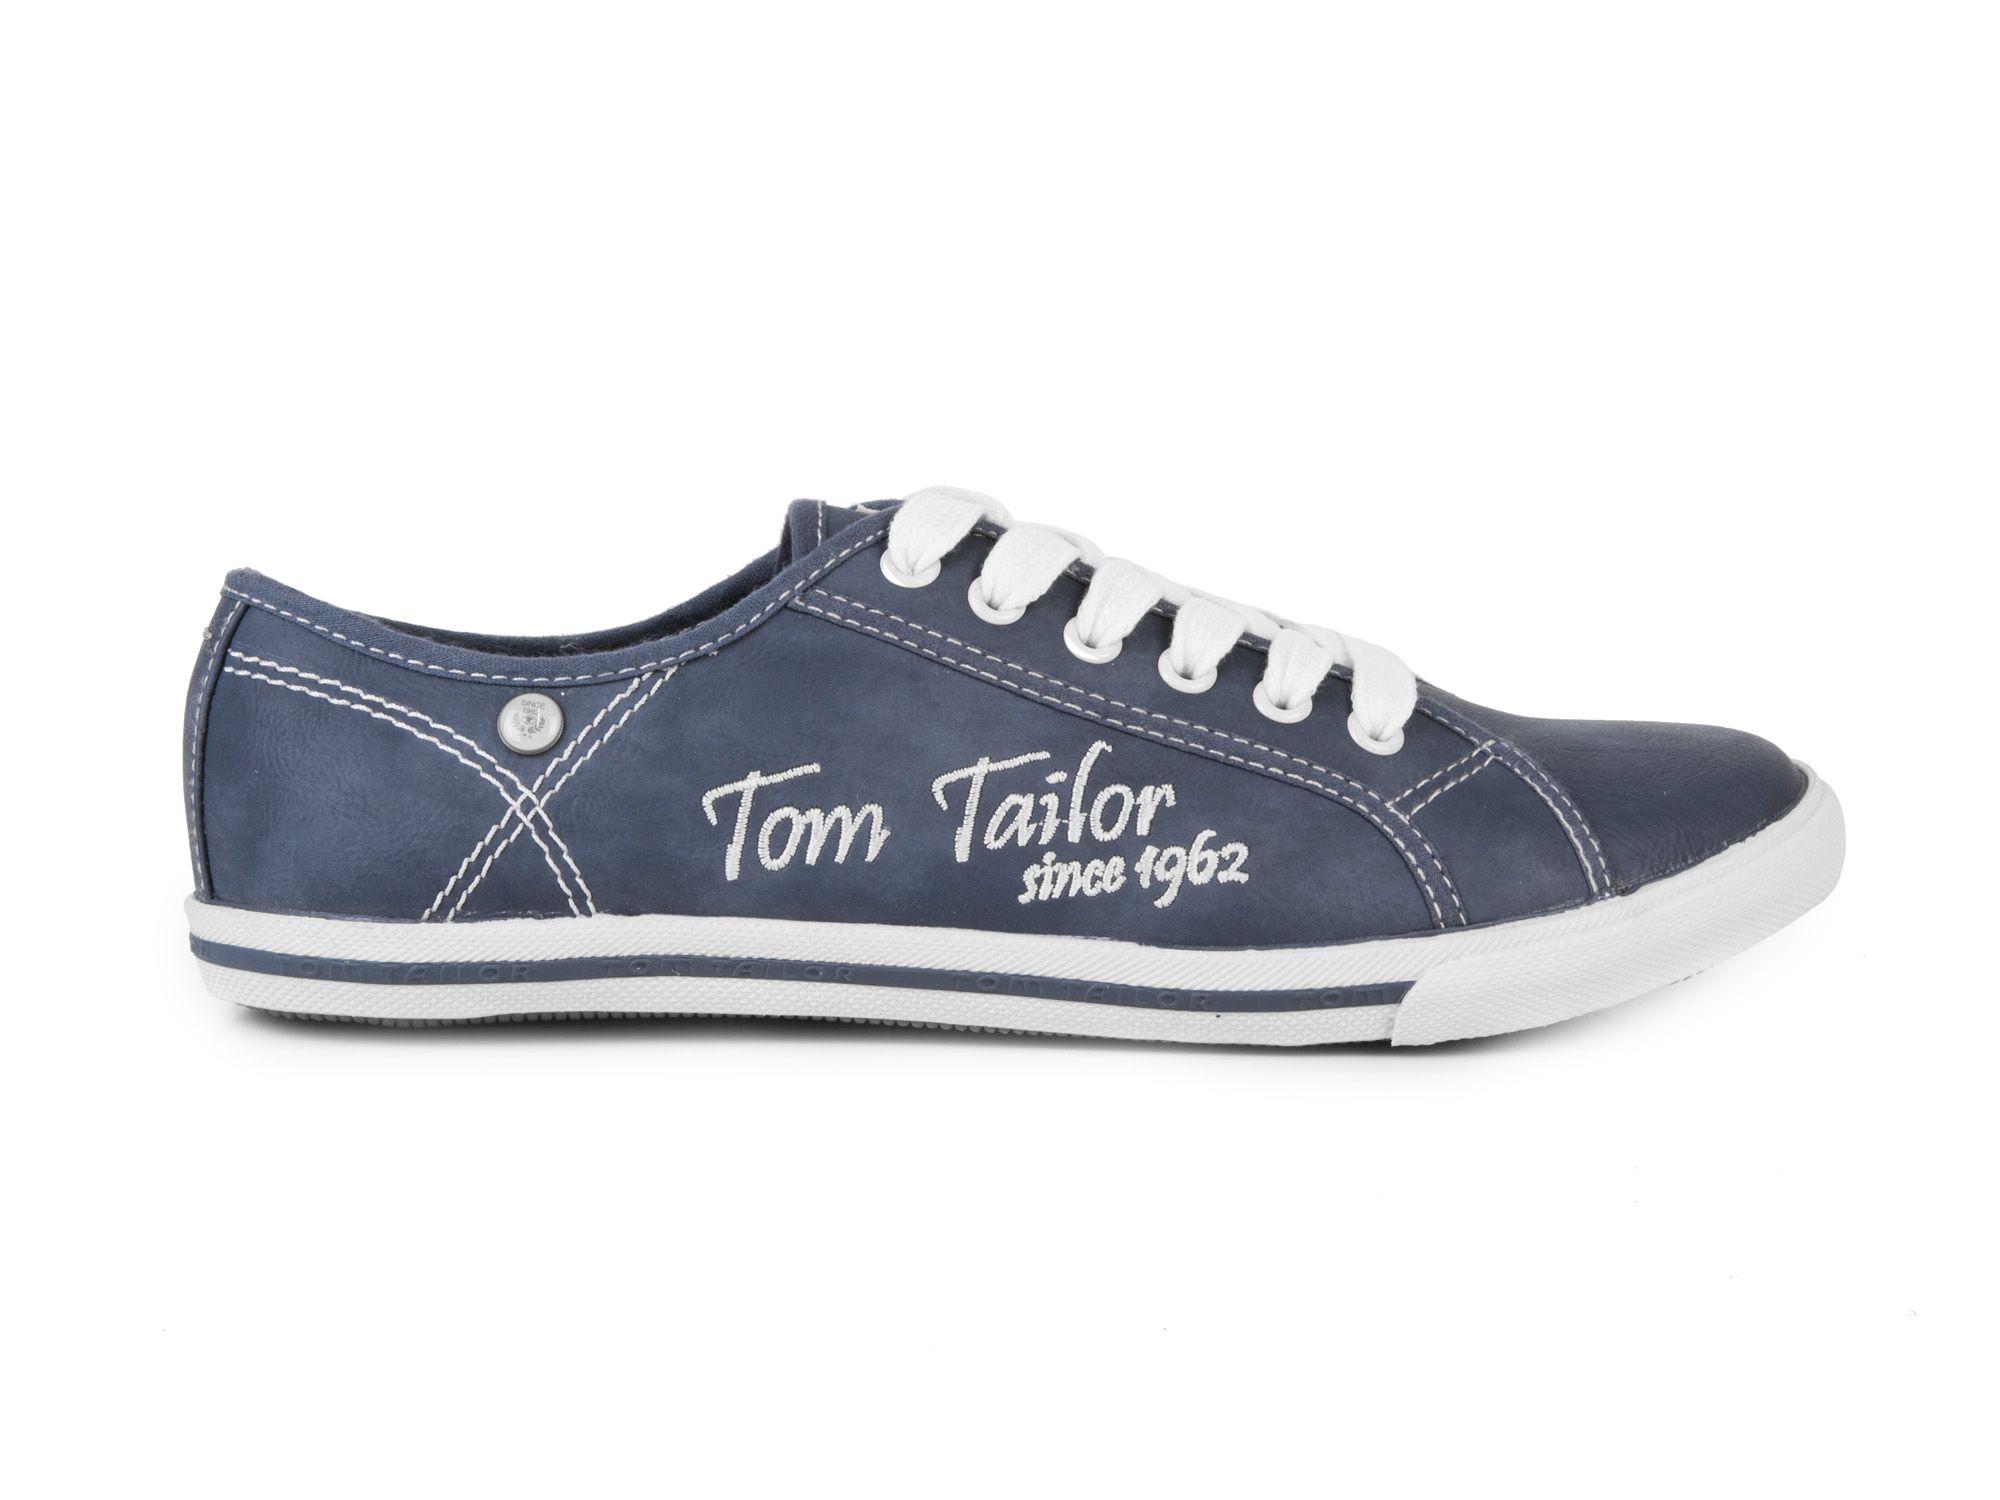 f6af51f2089 Tom Tailor Dámské módní tenisky Catania   modrá